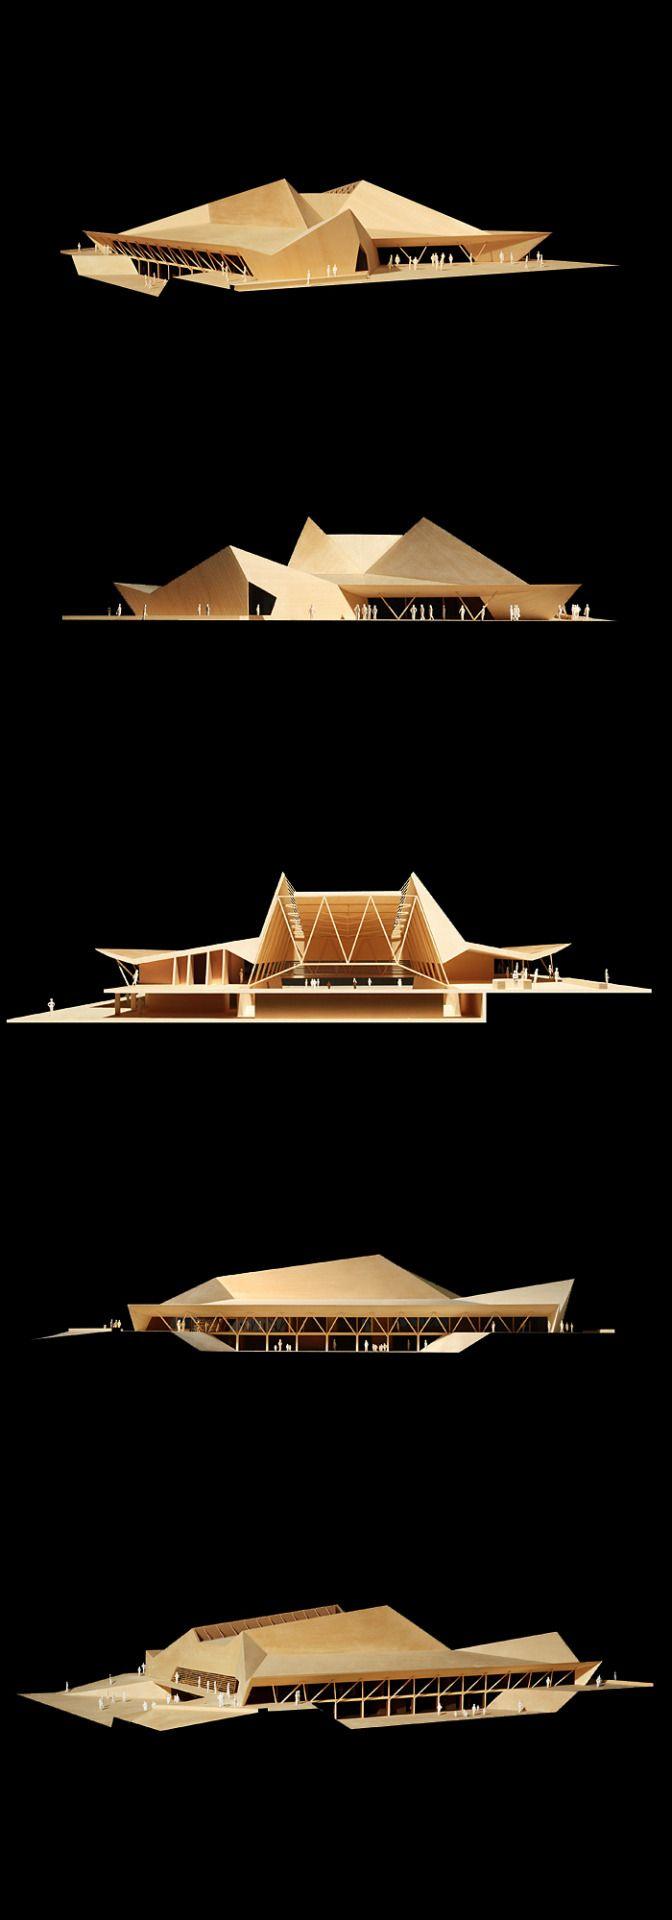 Marpole-Oakridge Community Centre | Patkau Architects Location: Vancouver, British Columbia, Canada | 2010-2011